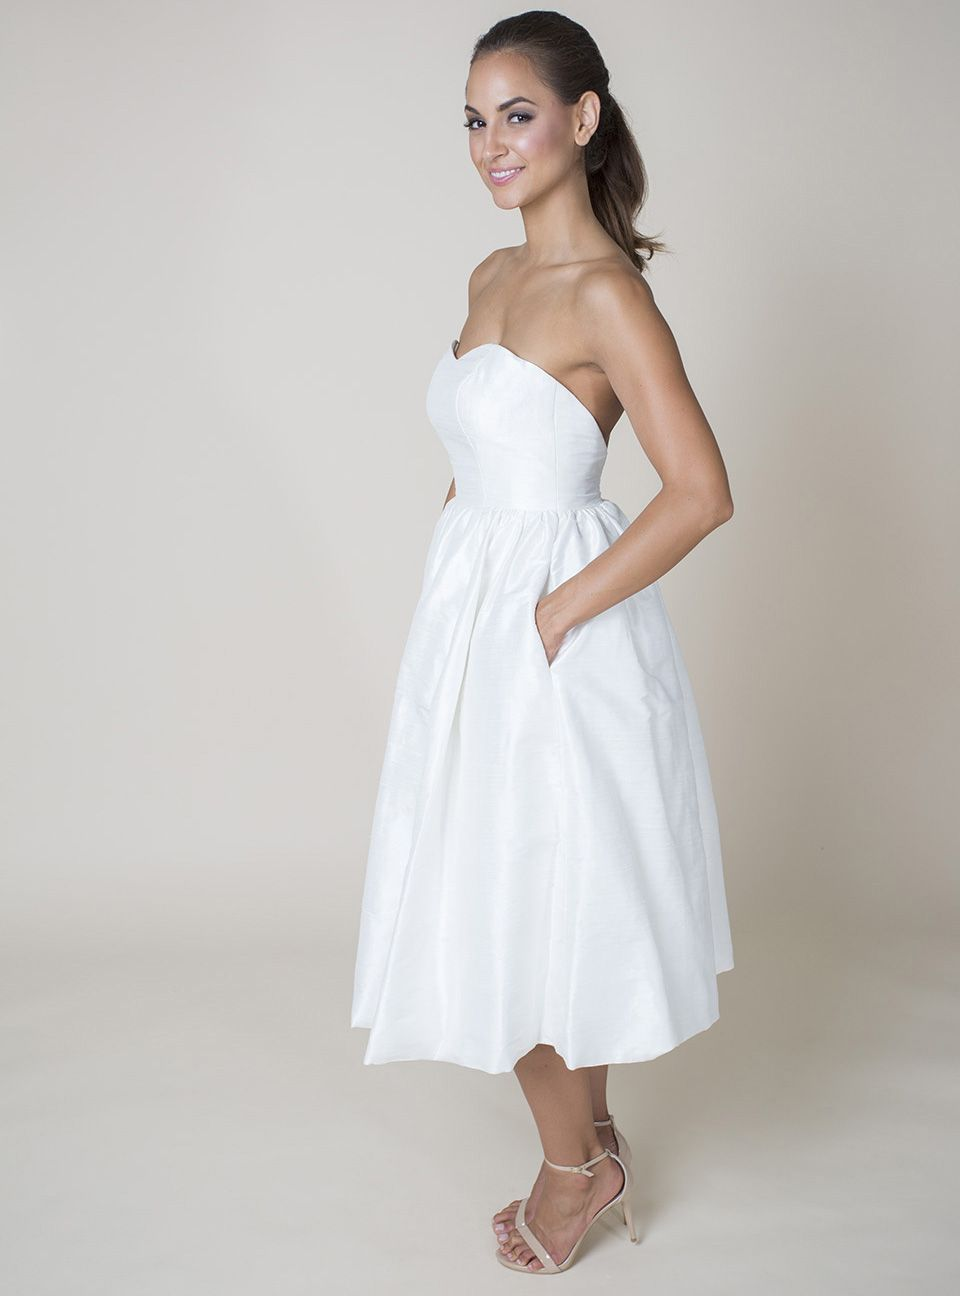 Ollie aliceu vintage and sweet this tealength wedding dress